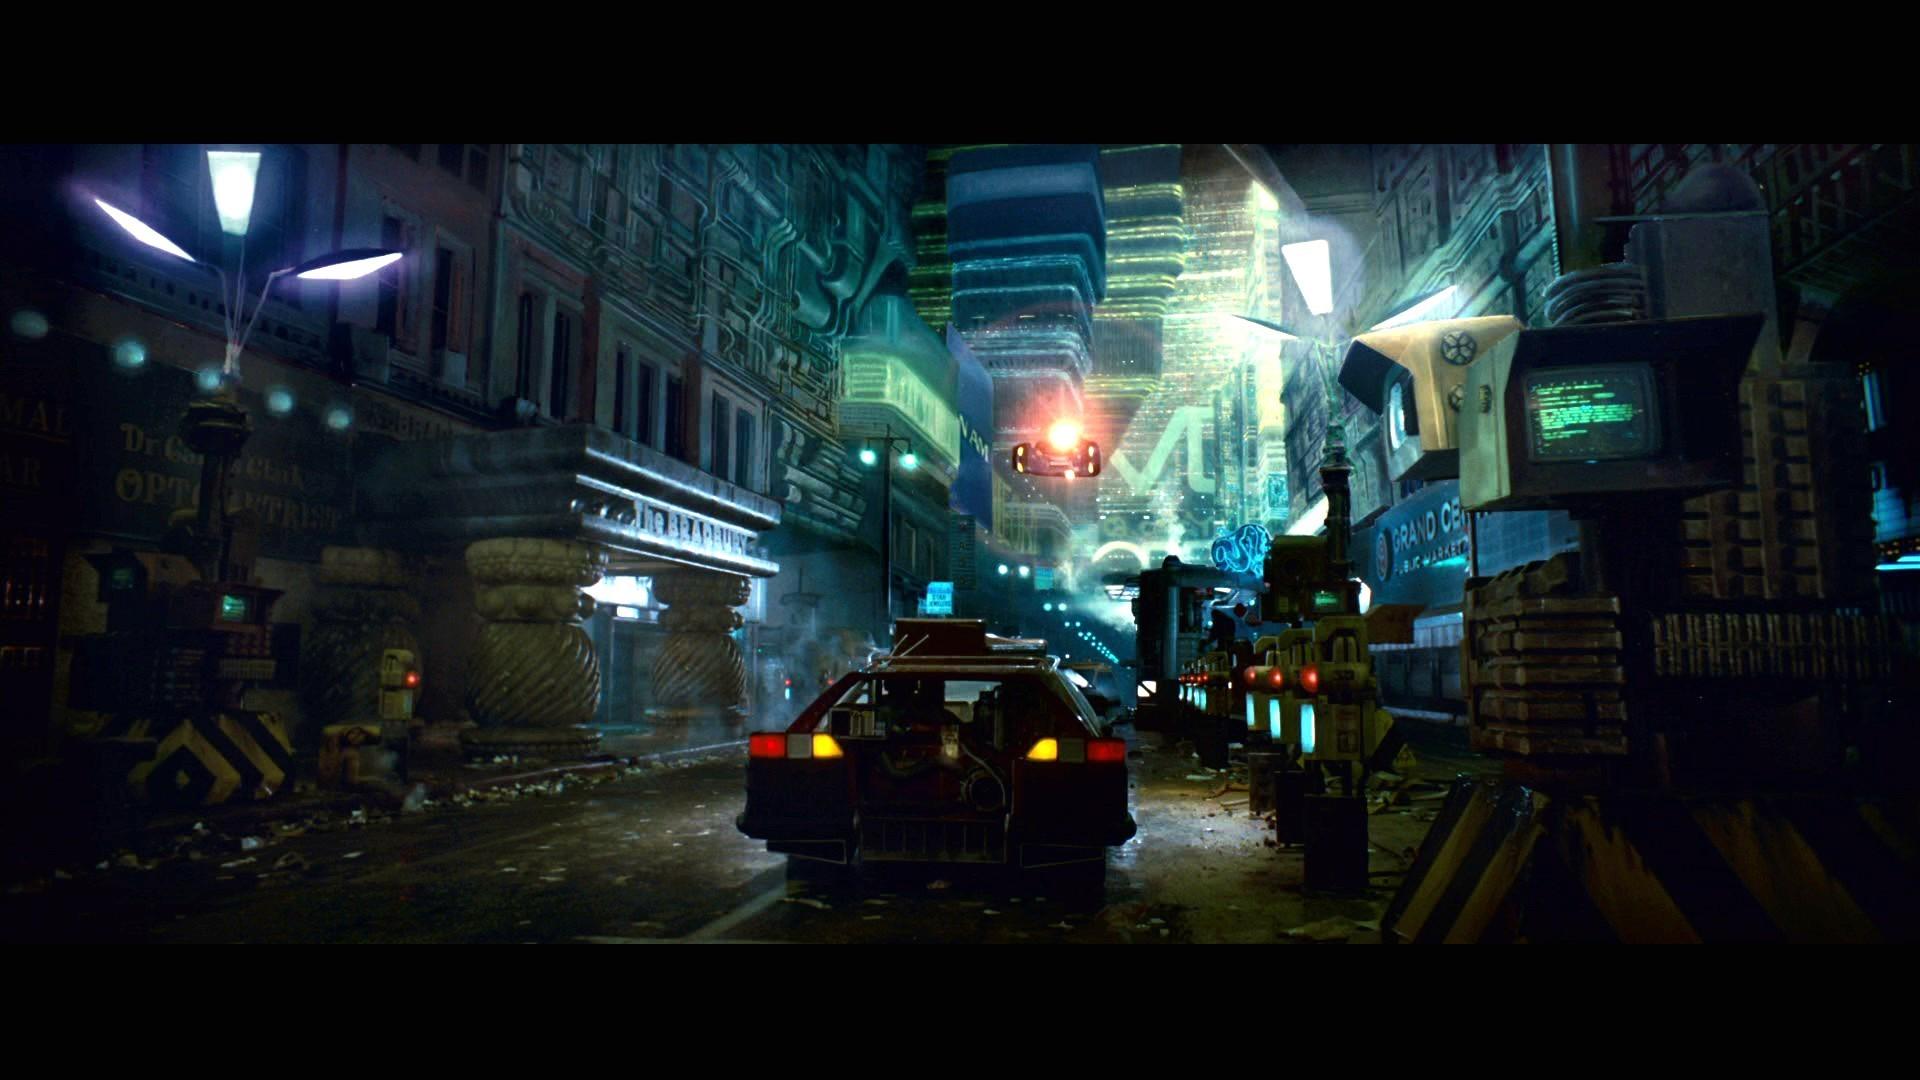 Res: 1920x1080, Extraordinary Blade Runner Wallpaper